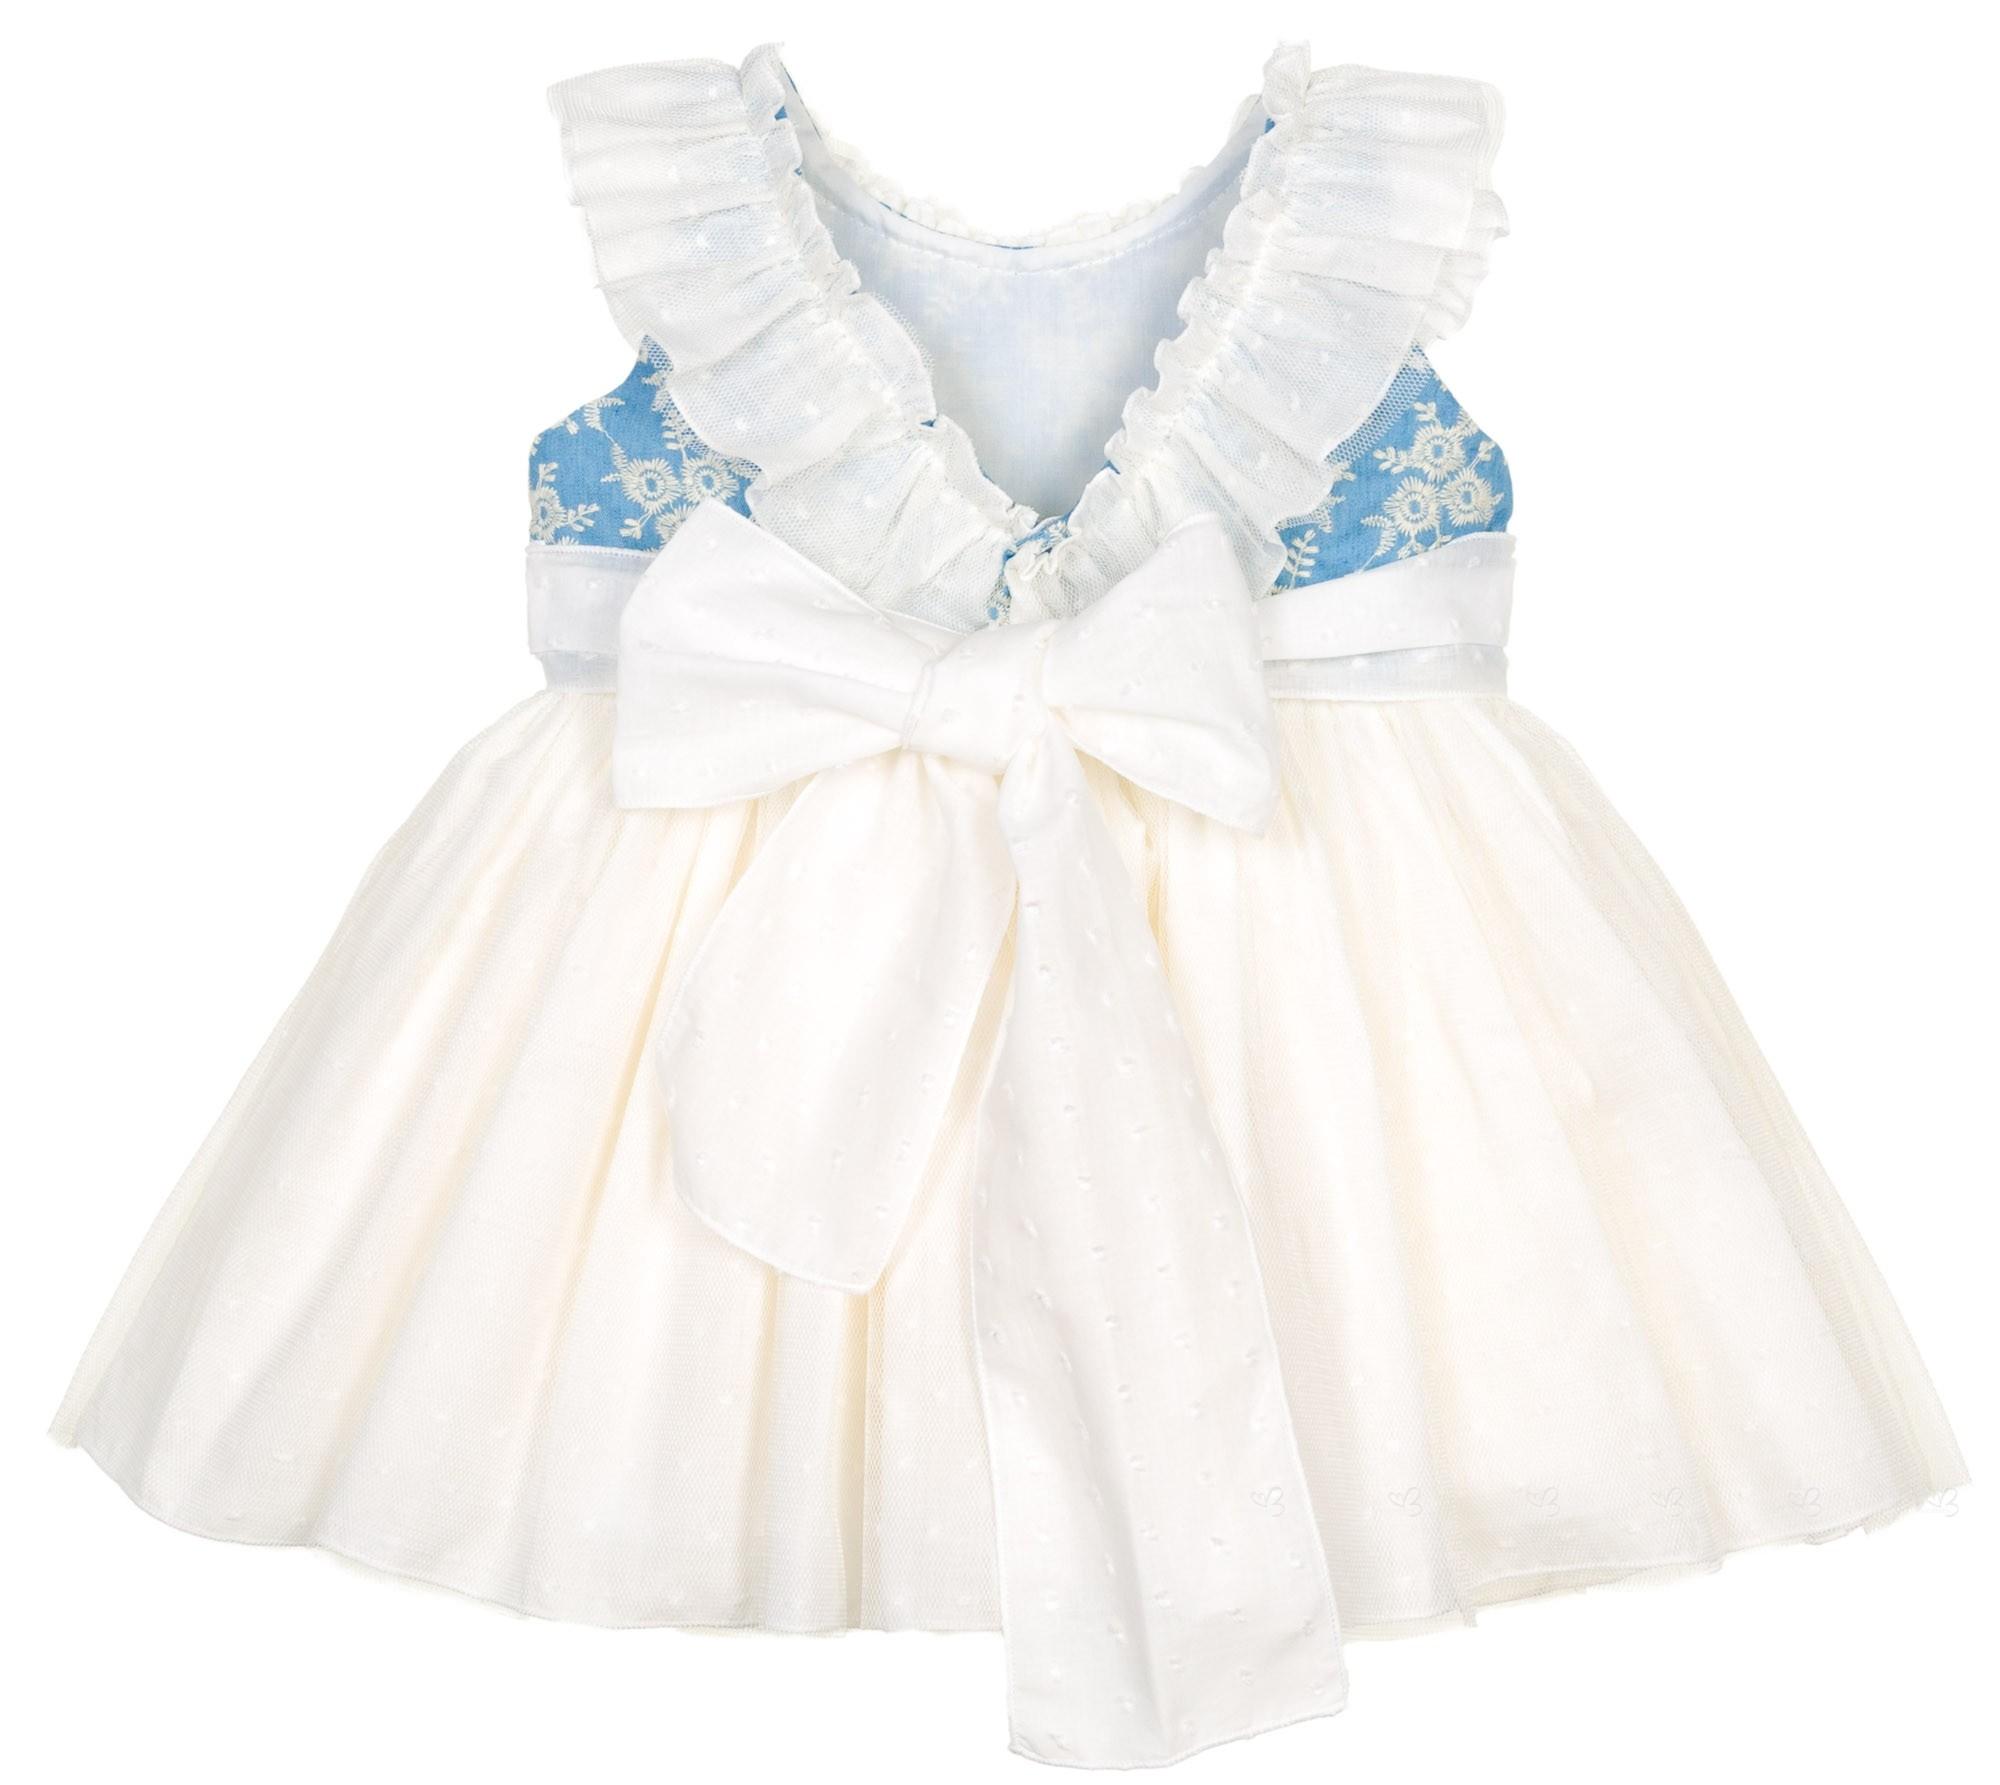 4072a23c9 Lappepa Moda Infantil Vestido Niña Combinado Cuerpo Bordado Flores ...